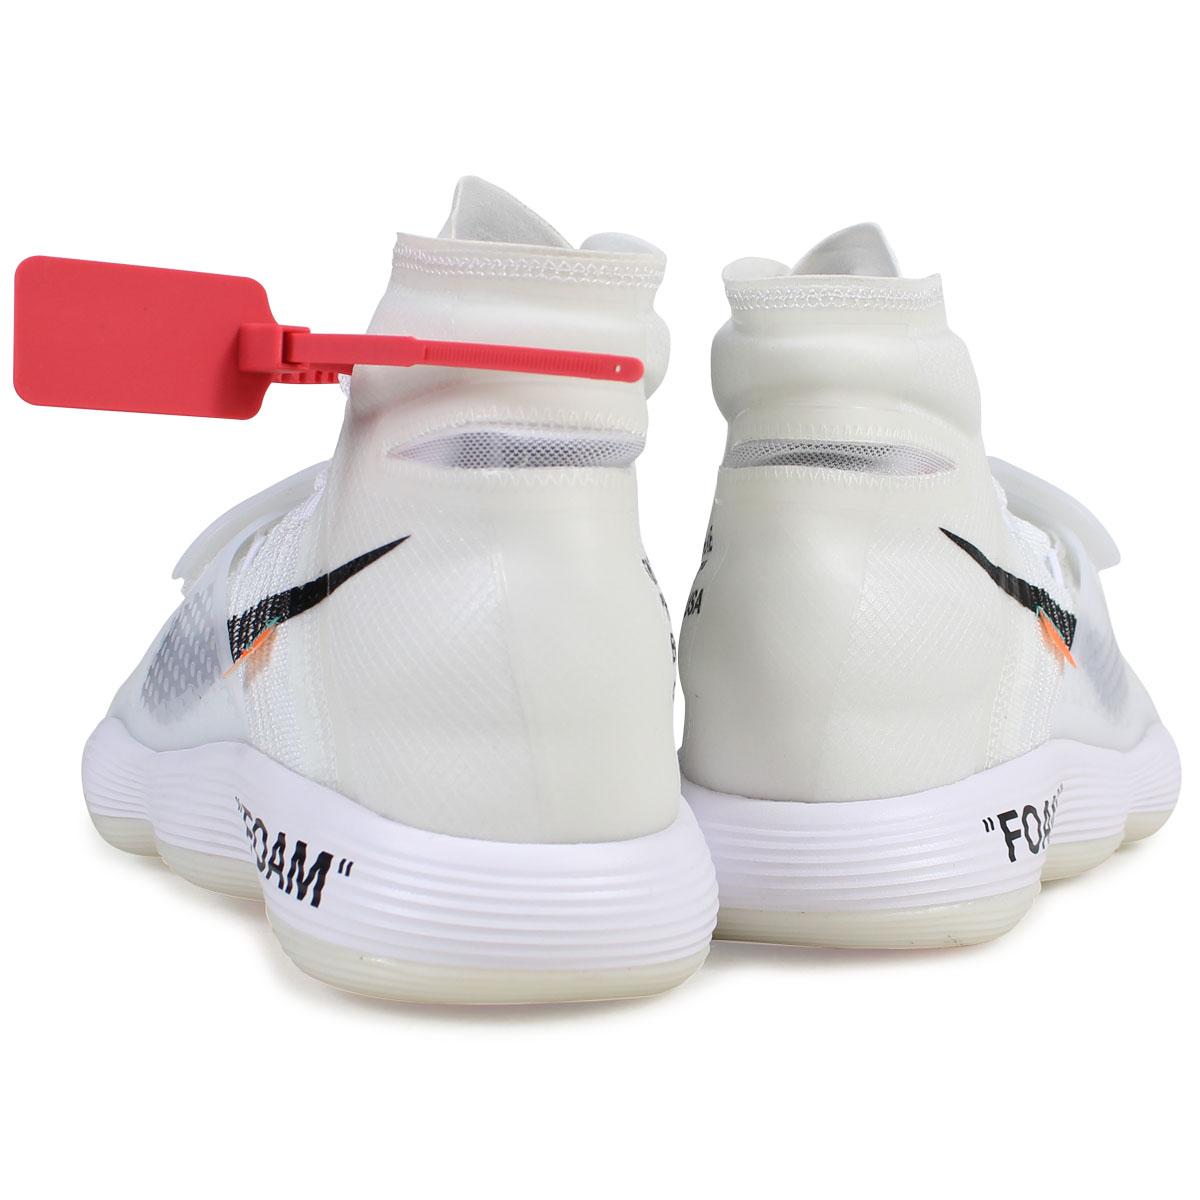 28a22fe0e8fb NIKE THE TEN REACT HYPERDUNK 2017 FK Nike OFF-WHITE hyper dunk sneakers men  AJ4578-100 white